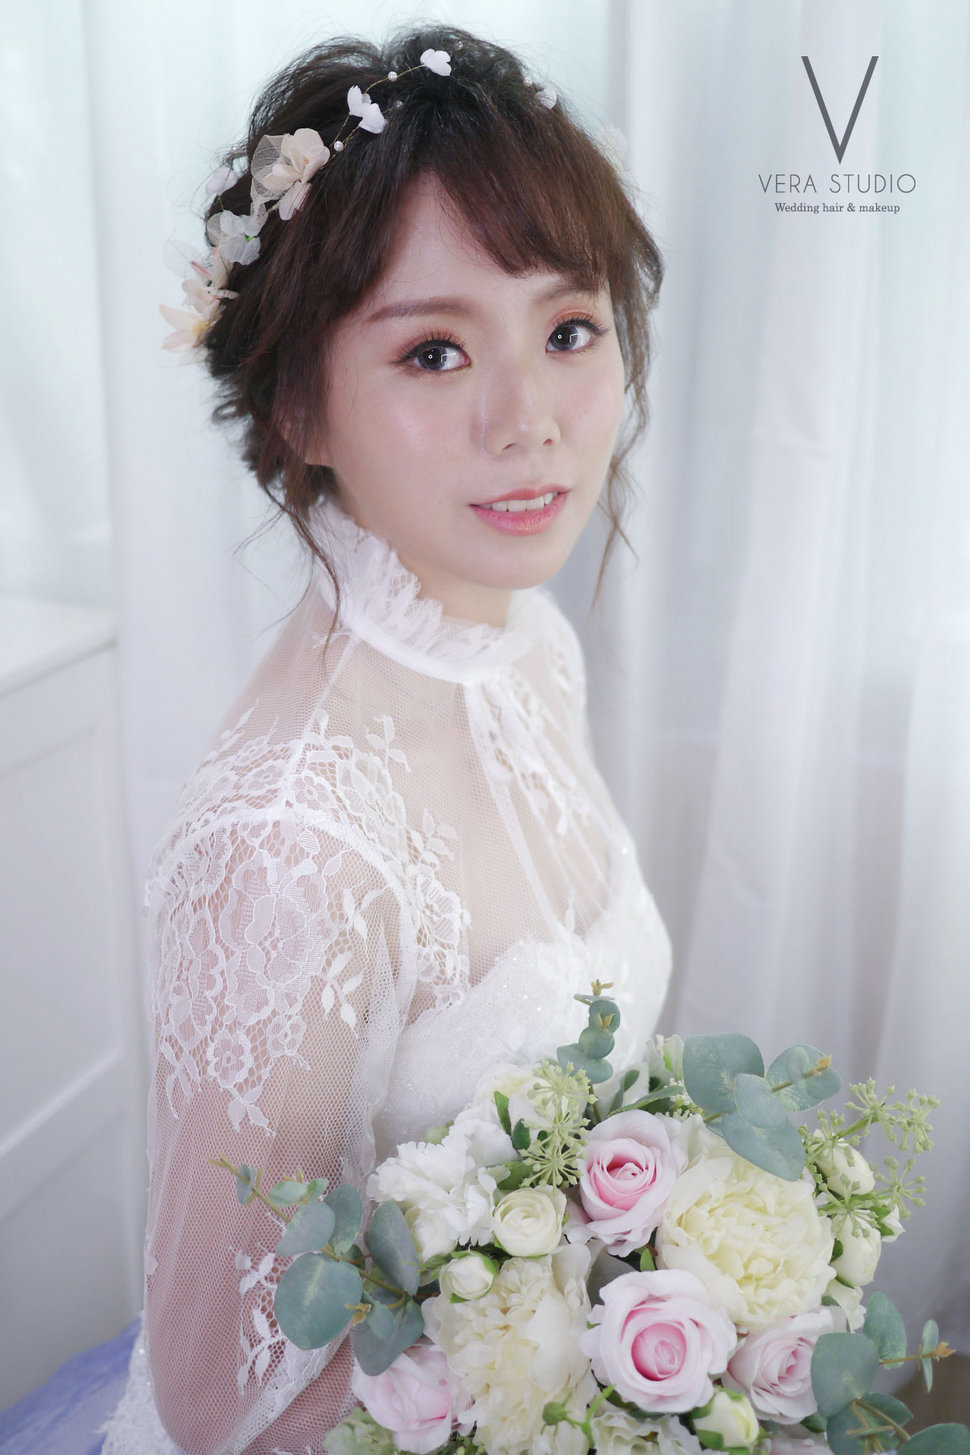 01 - Vera Studio 薇拉整體造型《結婚吧》